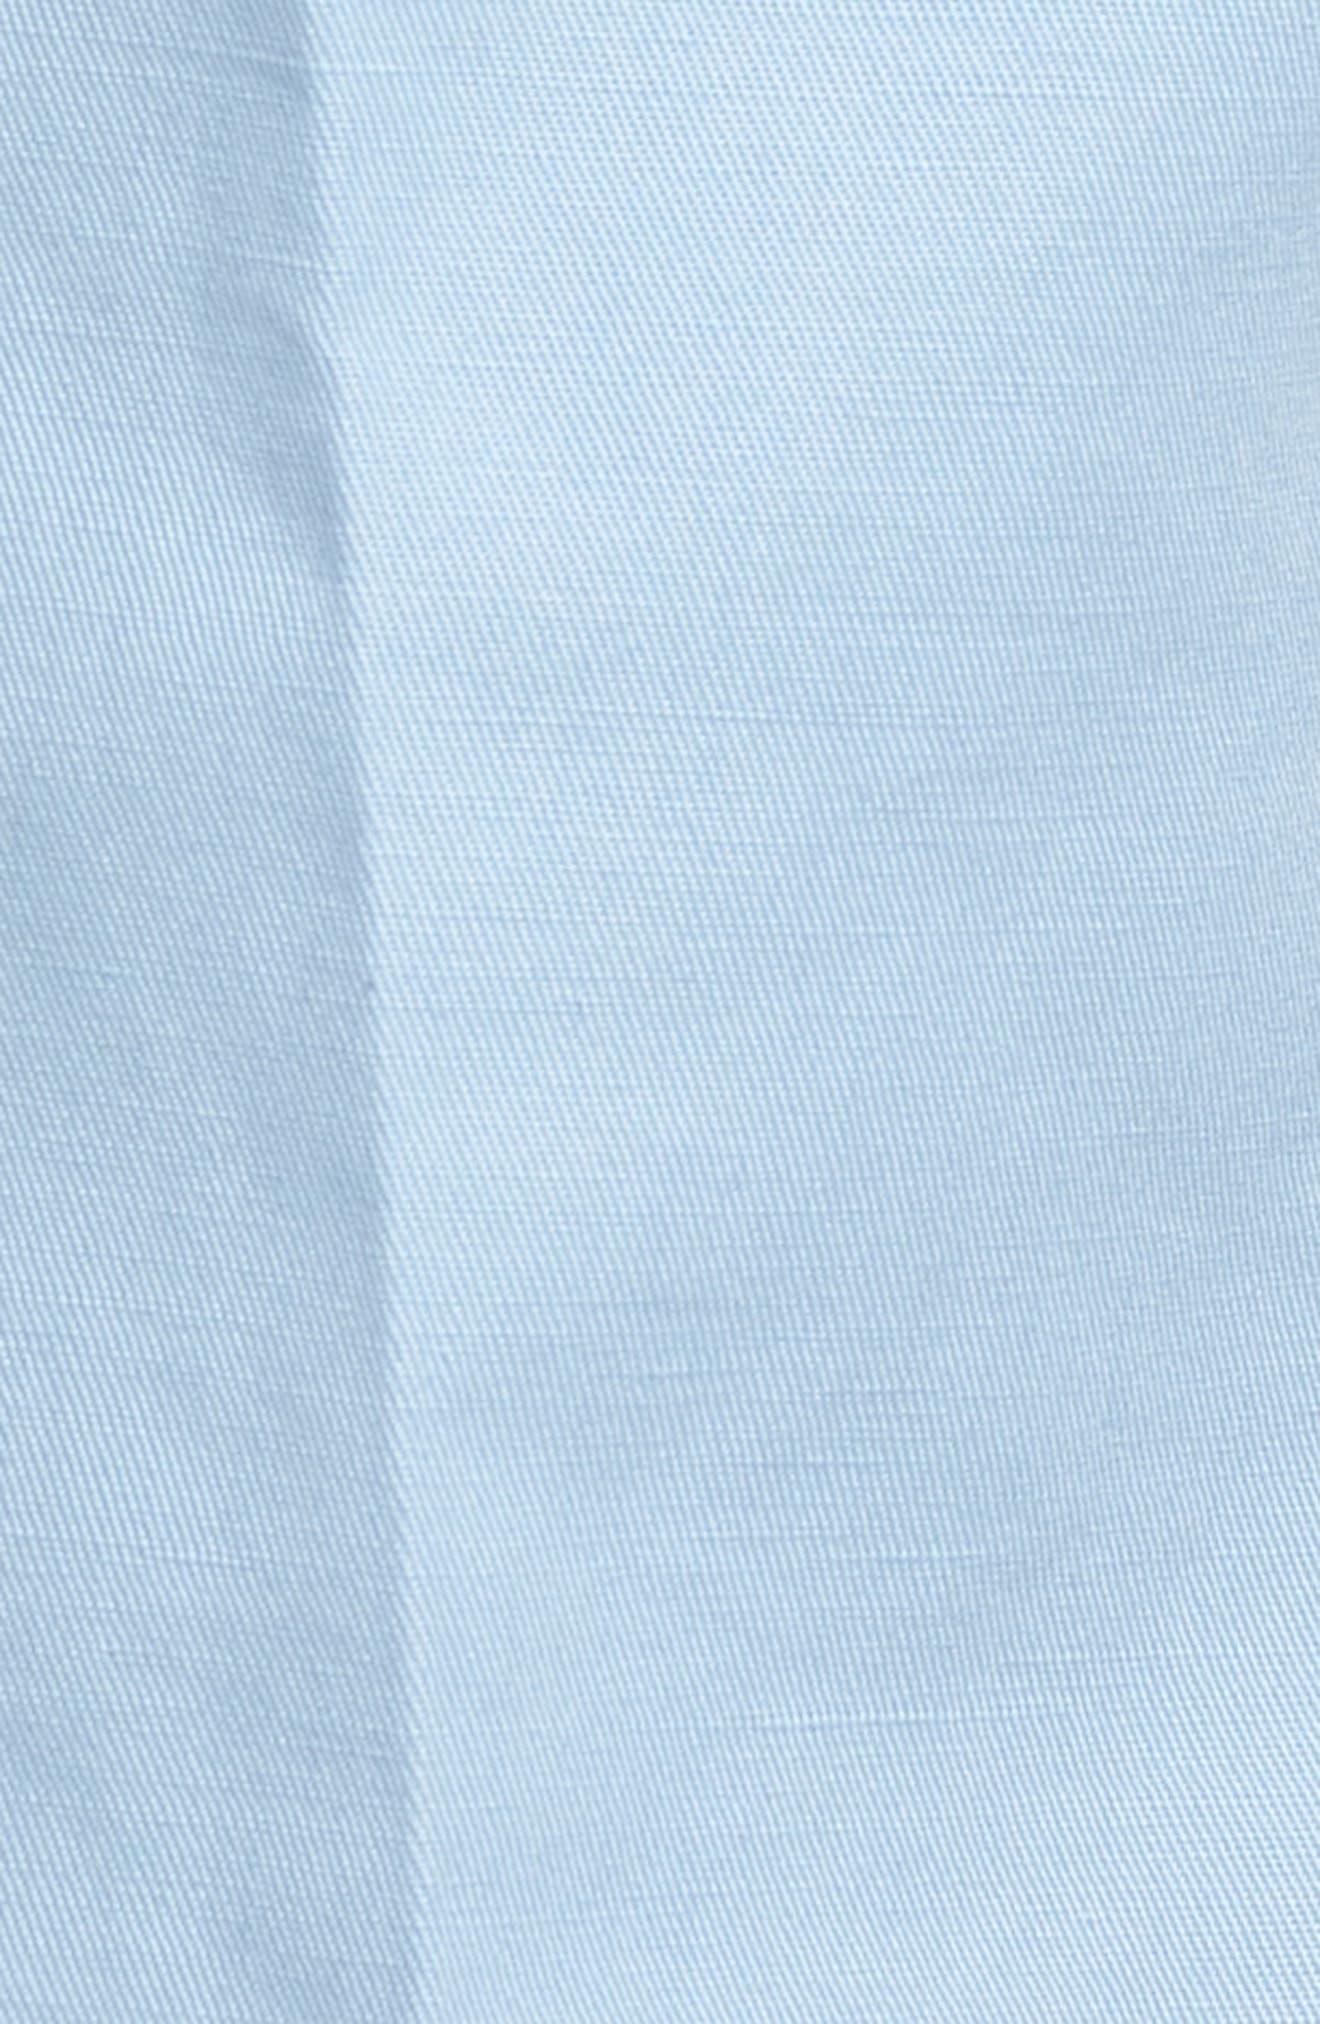 Flat Front Solid Cotton & Linen Trousers,                             Alternate thumbnail 7, color,